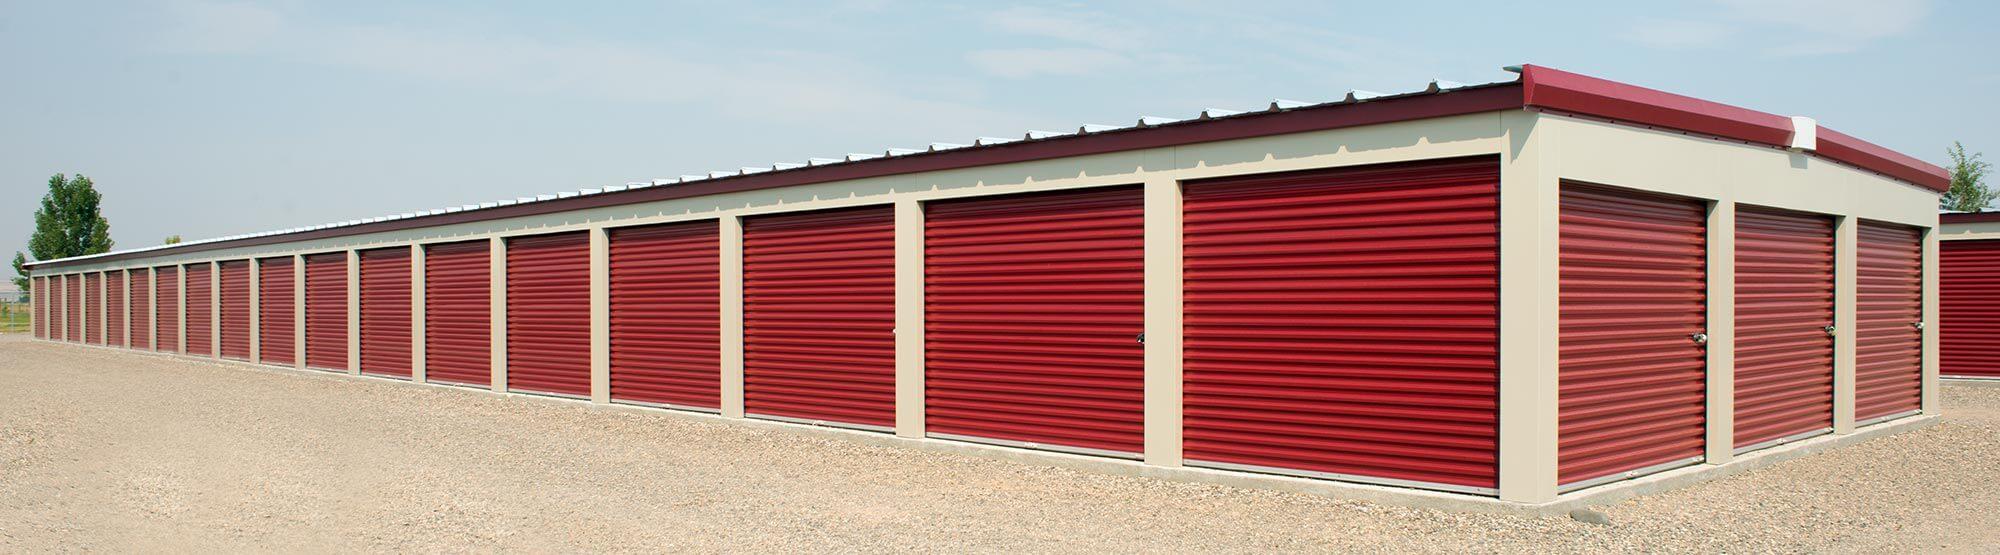 Row of red self storage units in Glendale, AZ